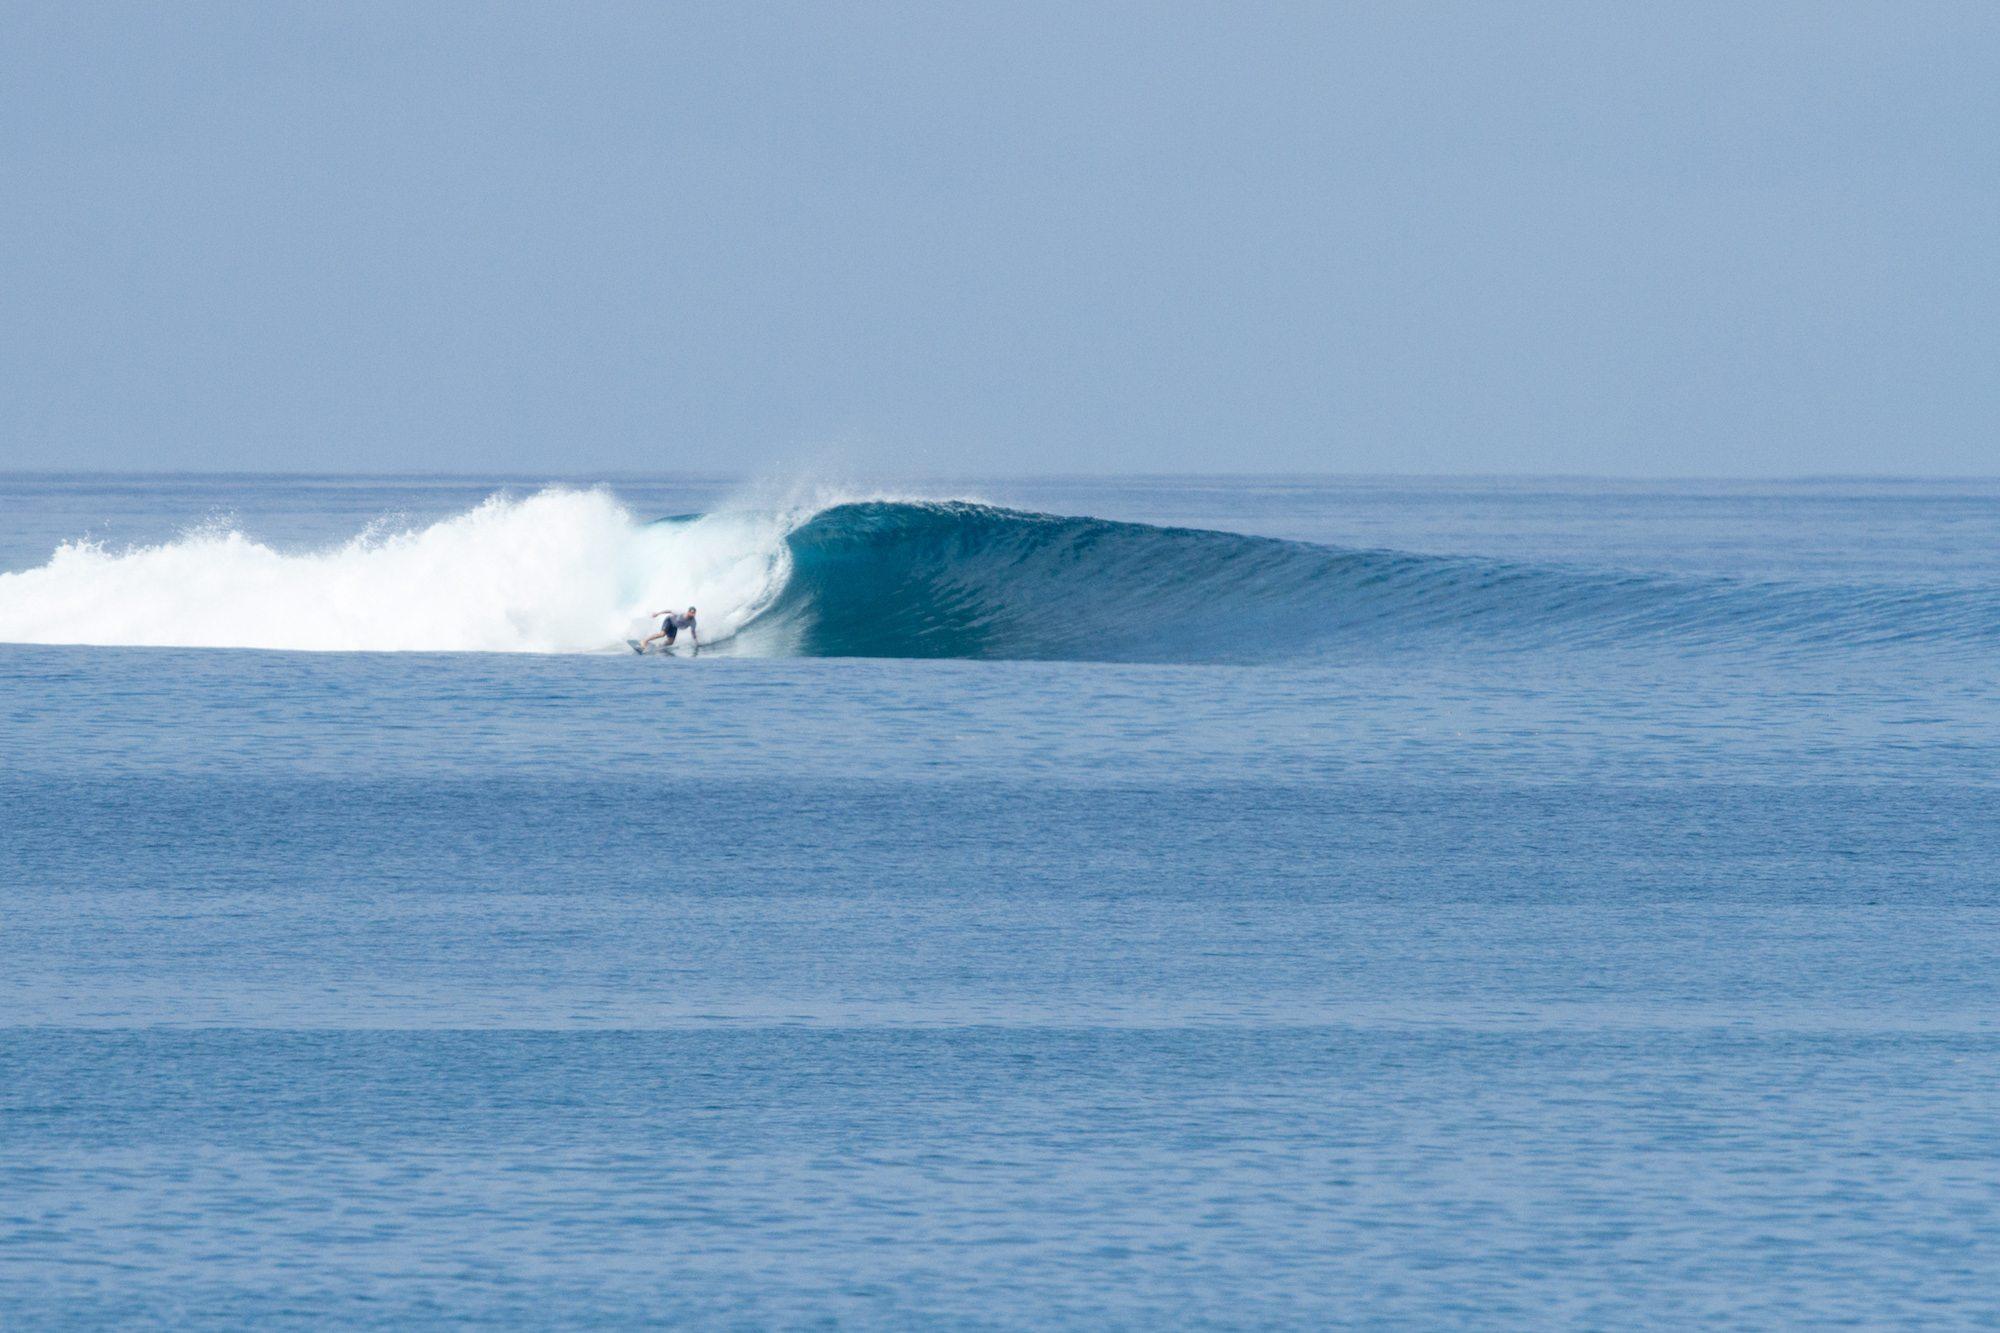 Clarets / Lolok Point / Bay of Plenty Lefts 17